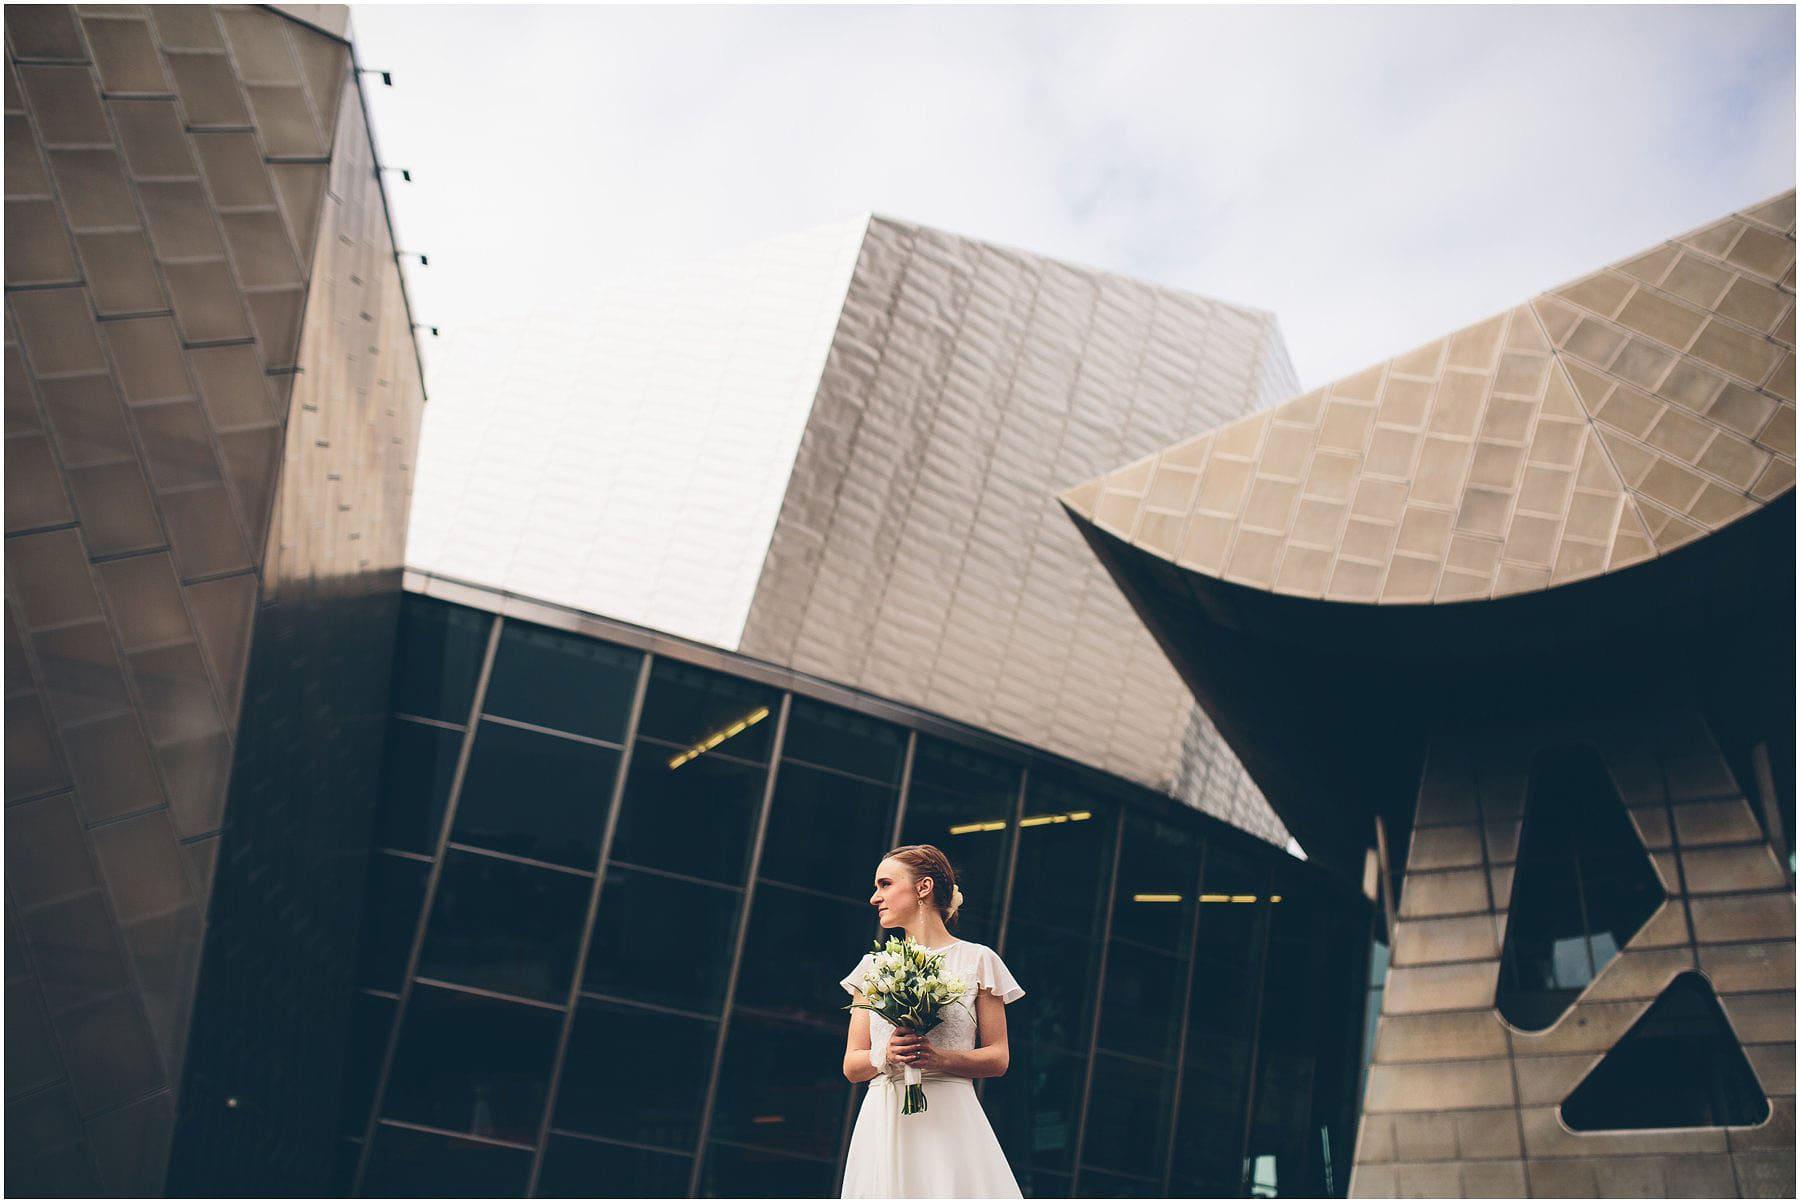 Lowry_Theatre_Wedding_Photography_0073